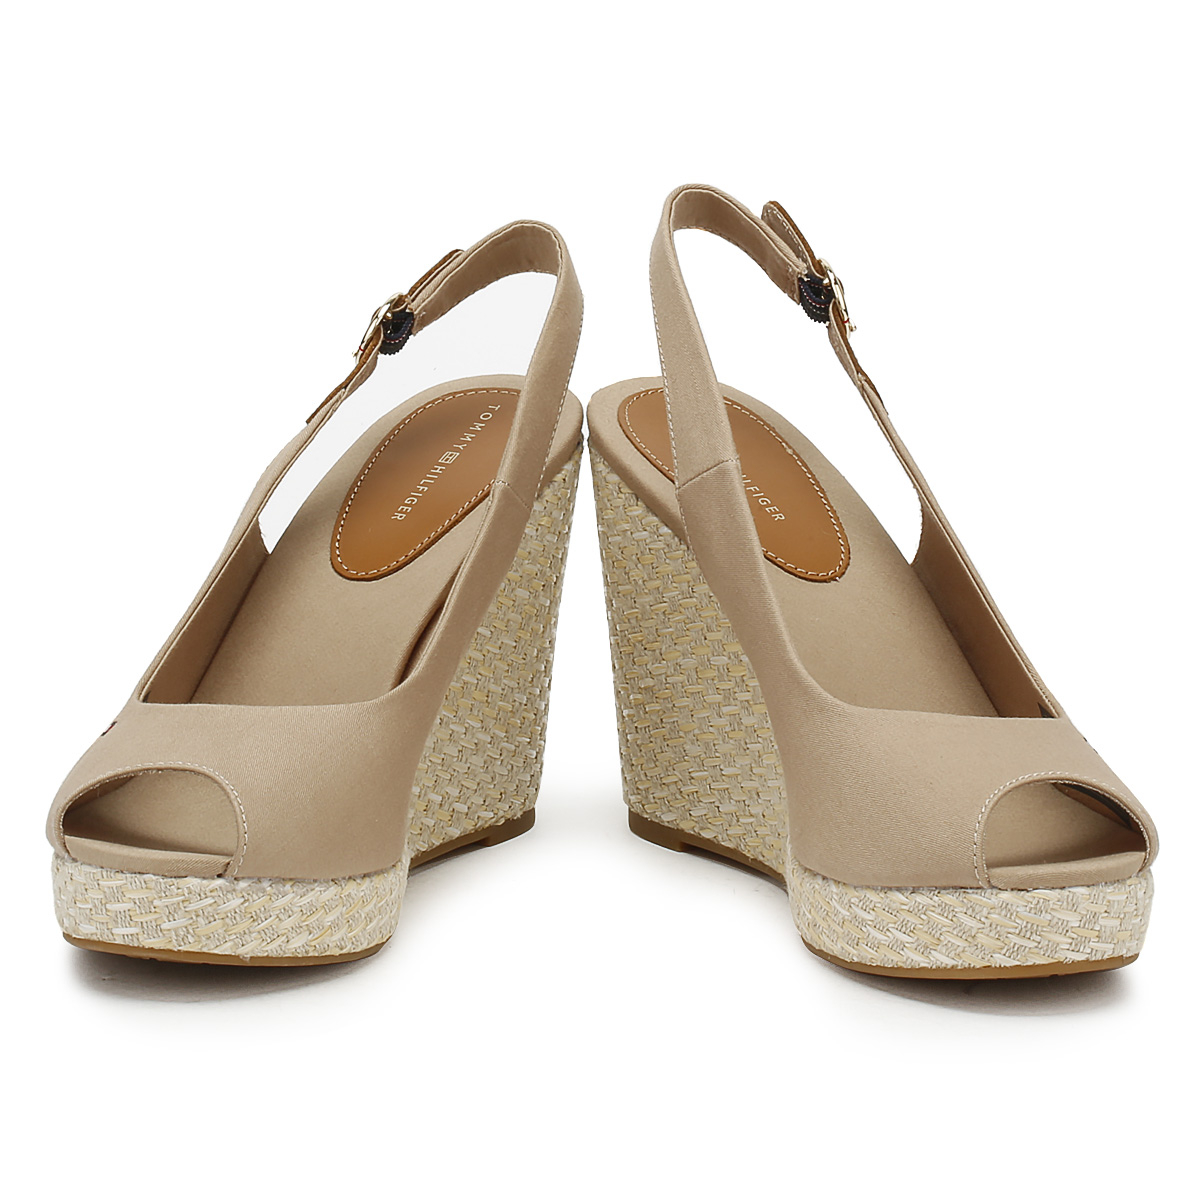 acf32f13b Tommy Hilfiger Womens Wedge Sandals Cobblestone Grey Elba Peep Toe Ladies  Shoes